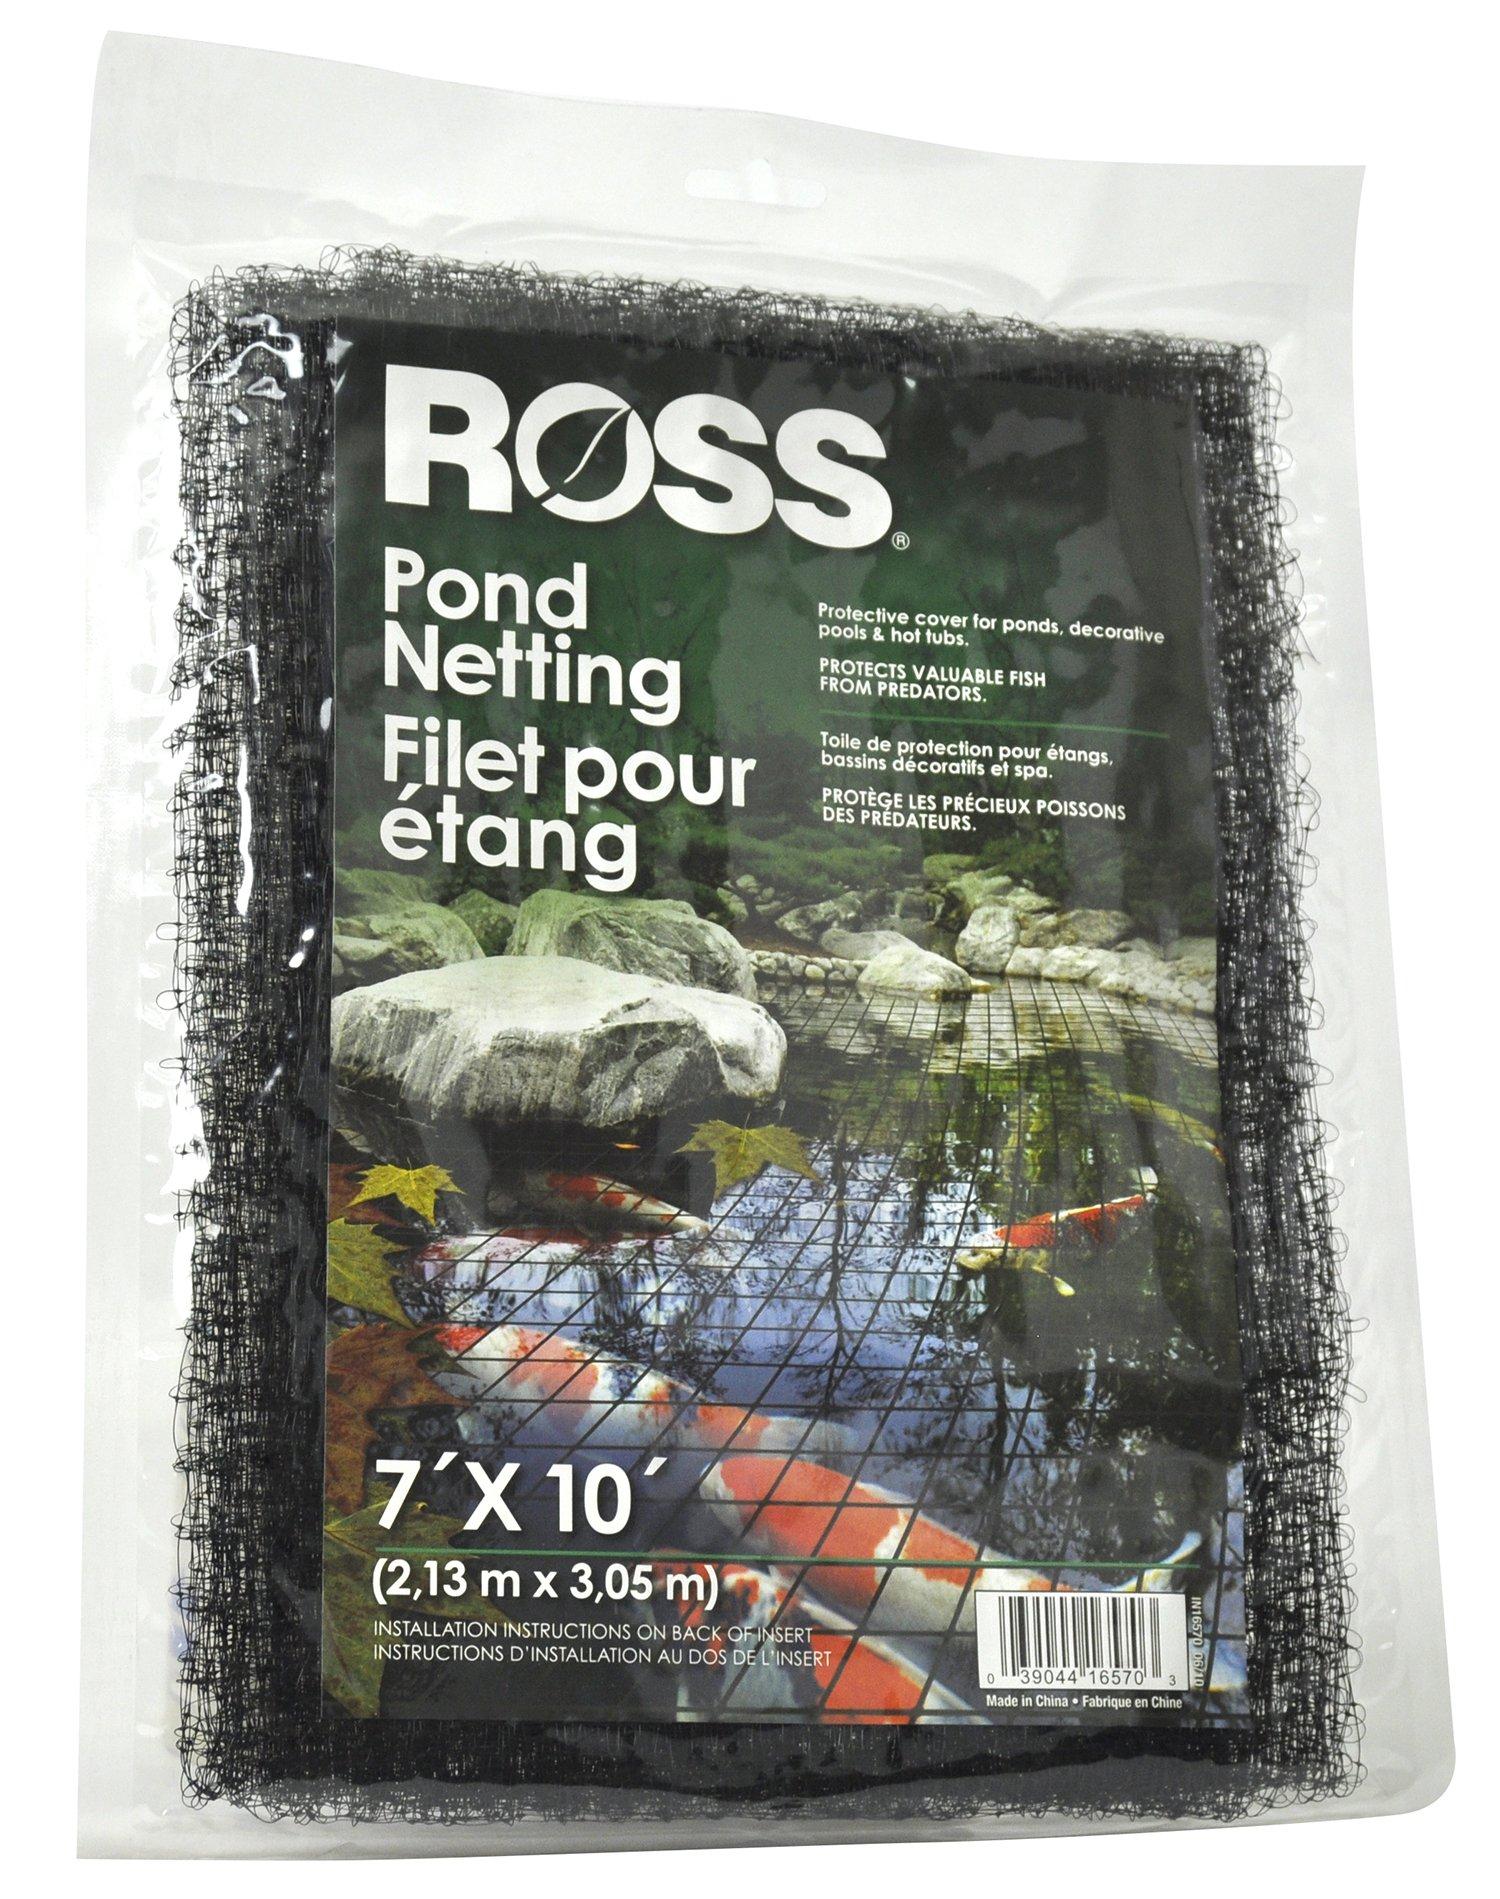 RainLeaf 7 x 10 Pond Netting Pool Protective Cover Netting,Pond Skimmer Net...